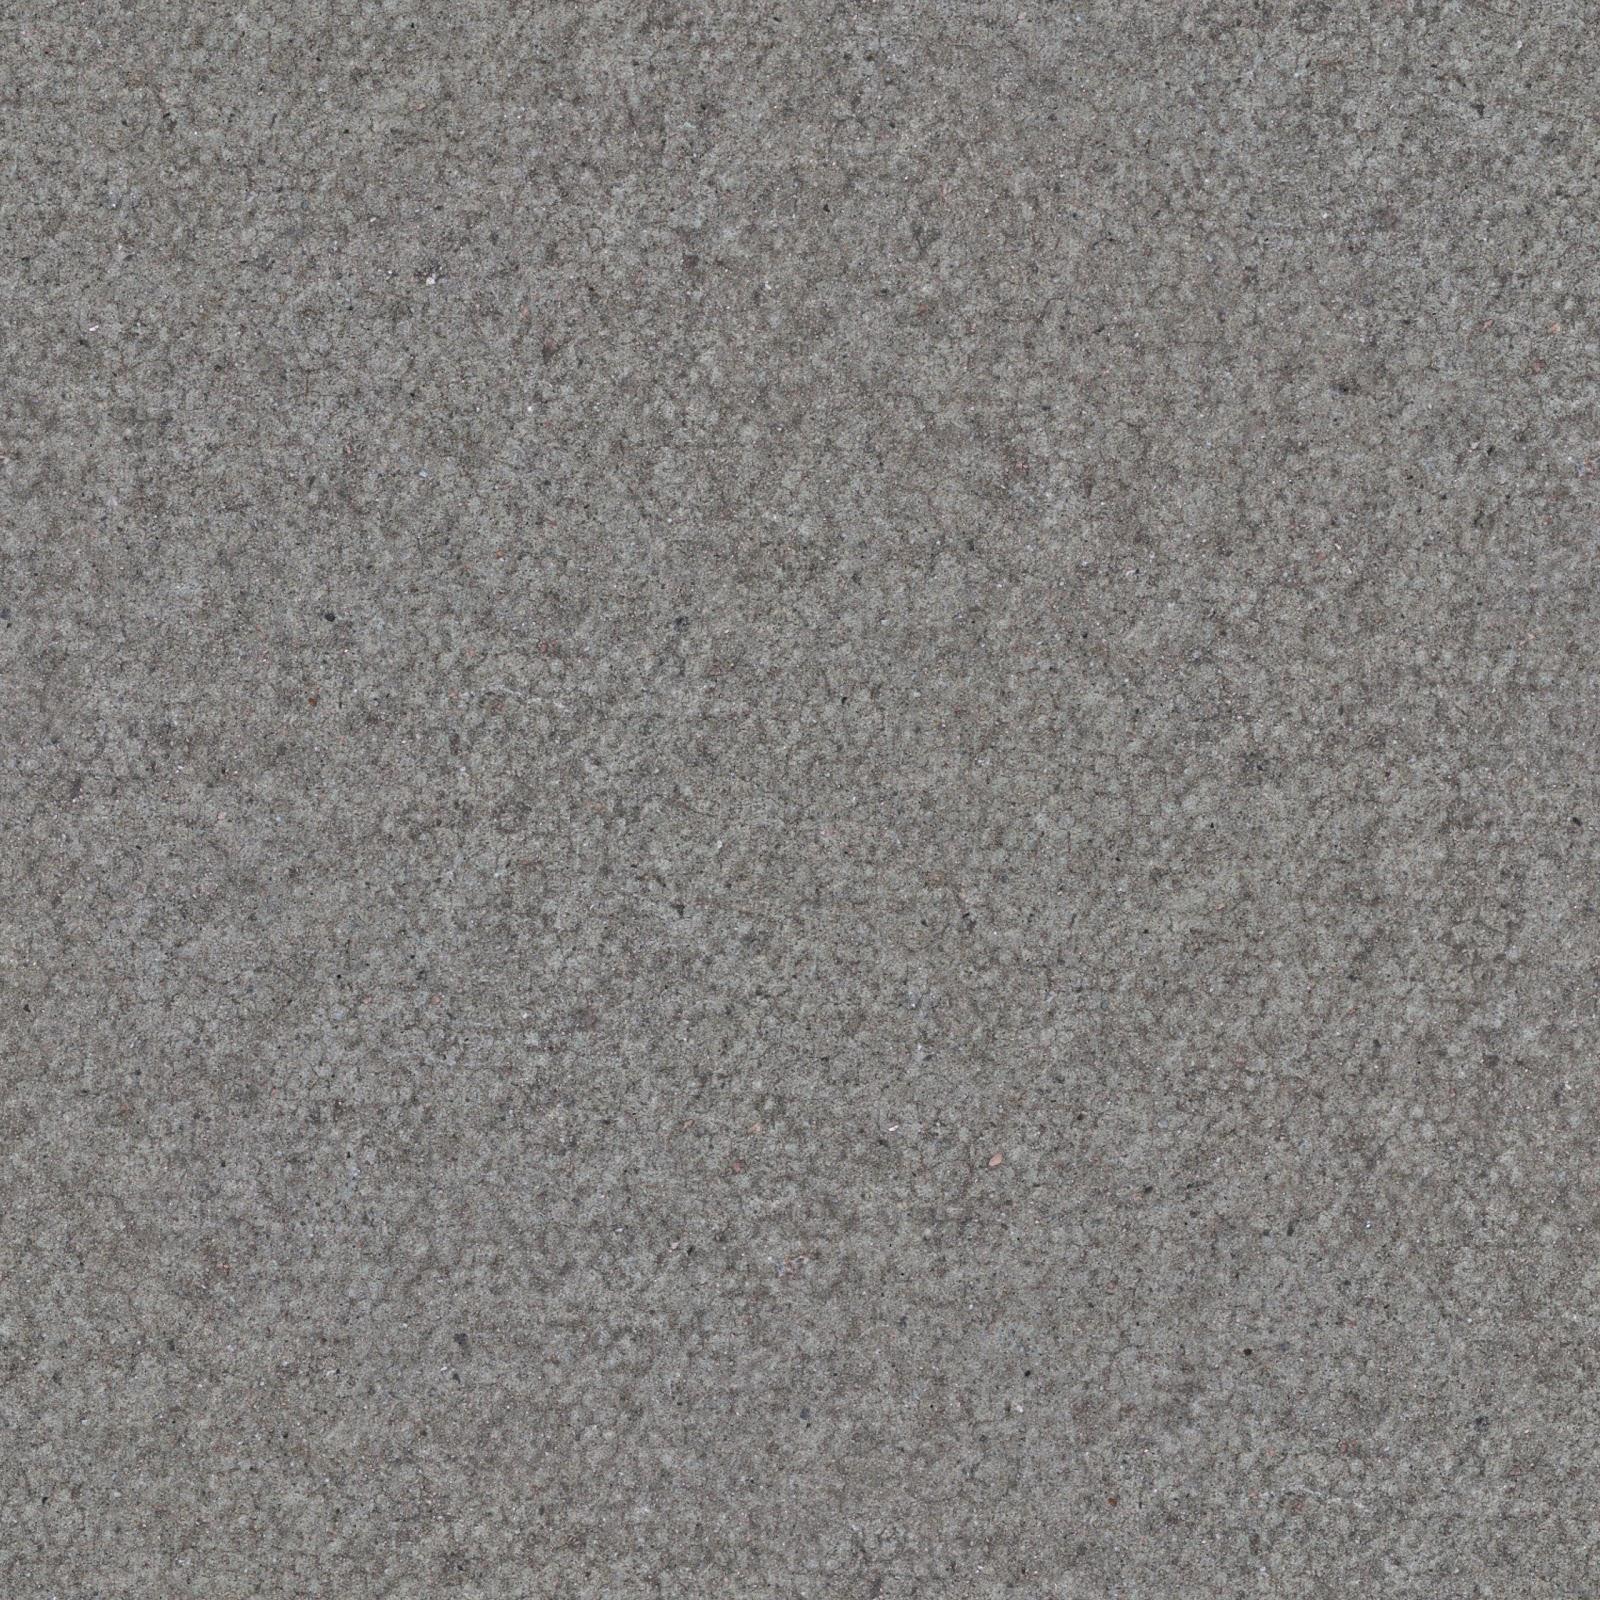 High Resolution Seamless Textures Seamless concrete floor tile